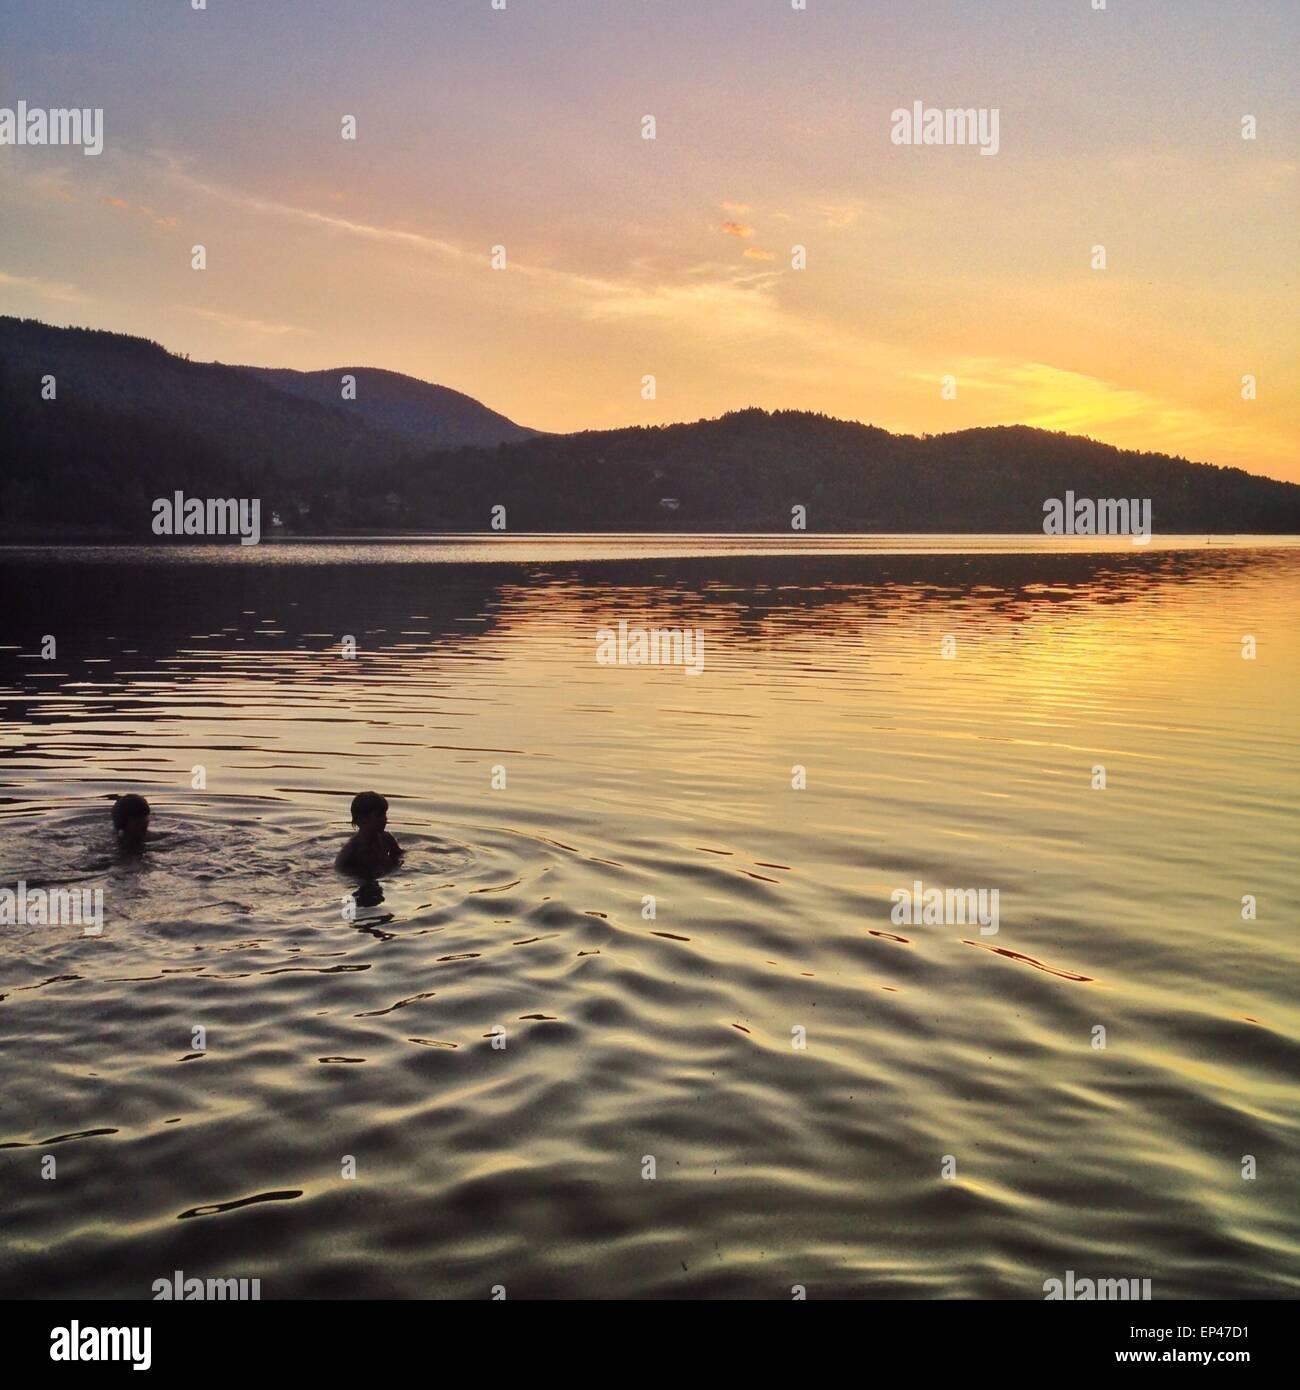 Zwei Jungen schwimmen im Meer bei Sonnenuntergang, Hof, Vestfold, Norwegen Stockbild